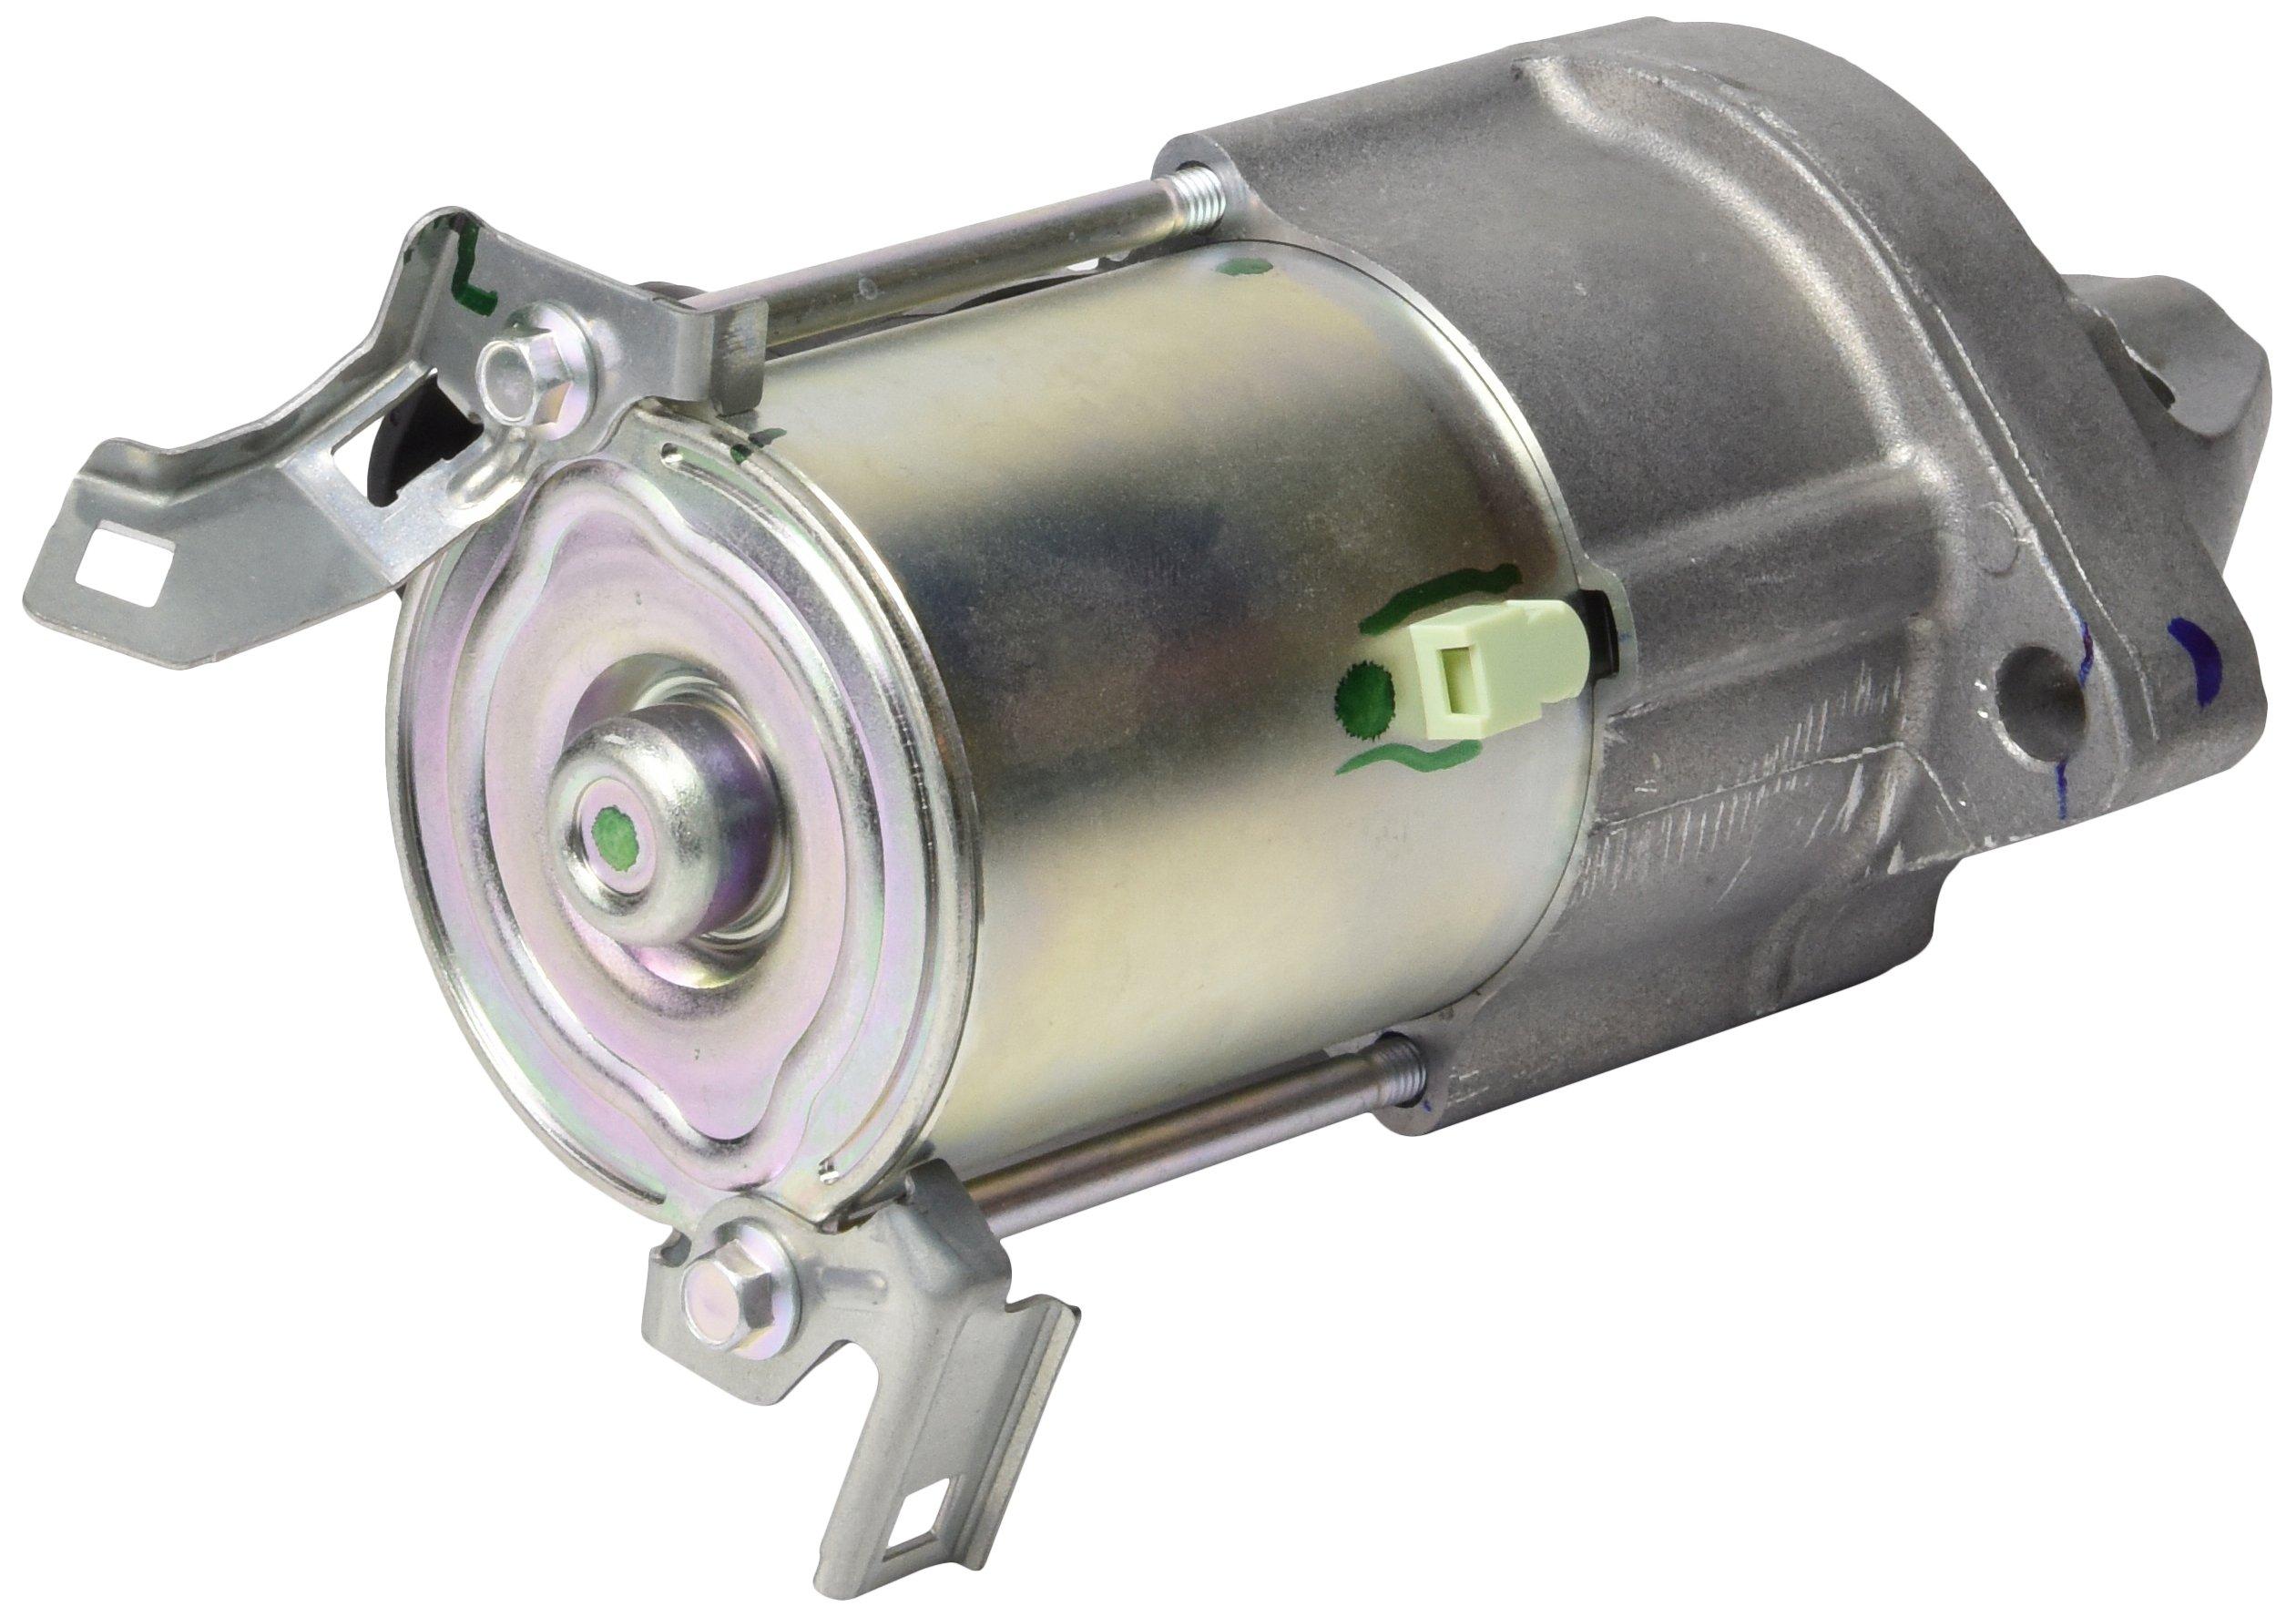 New Starter For 1.8L Automatic Transmission Honda Civic 06-11 31200-RNA-A50